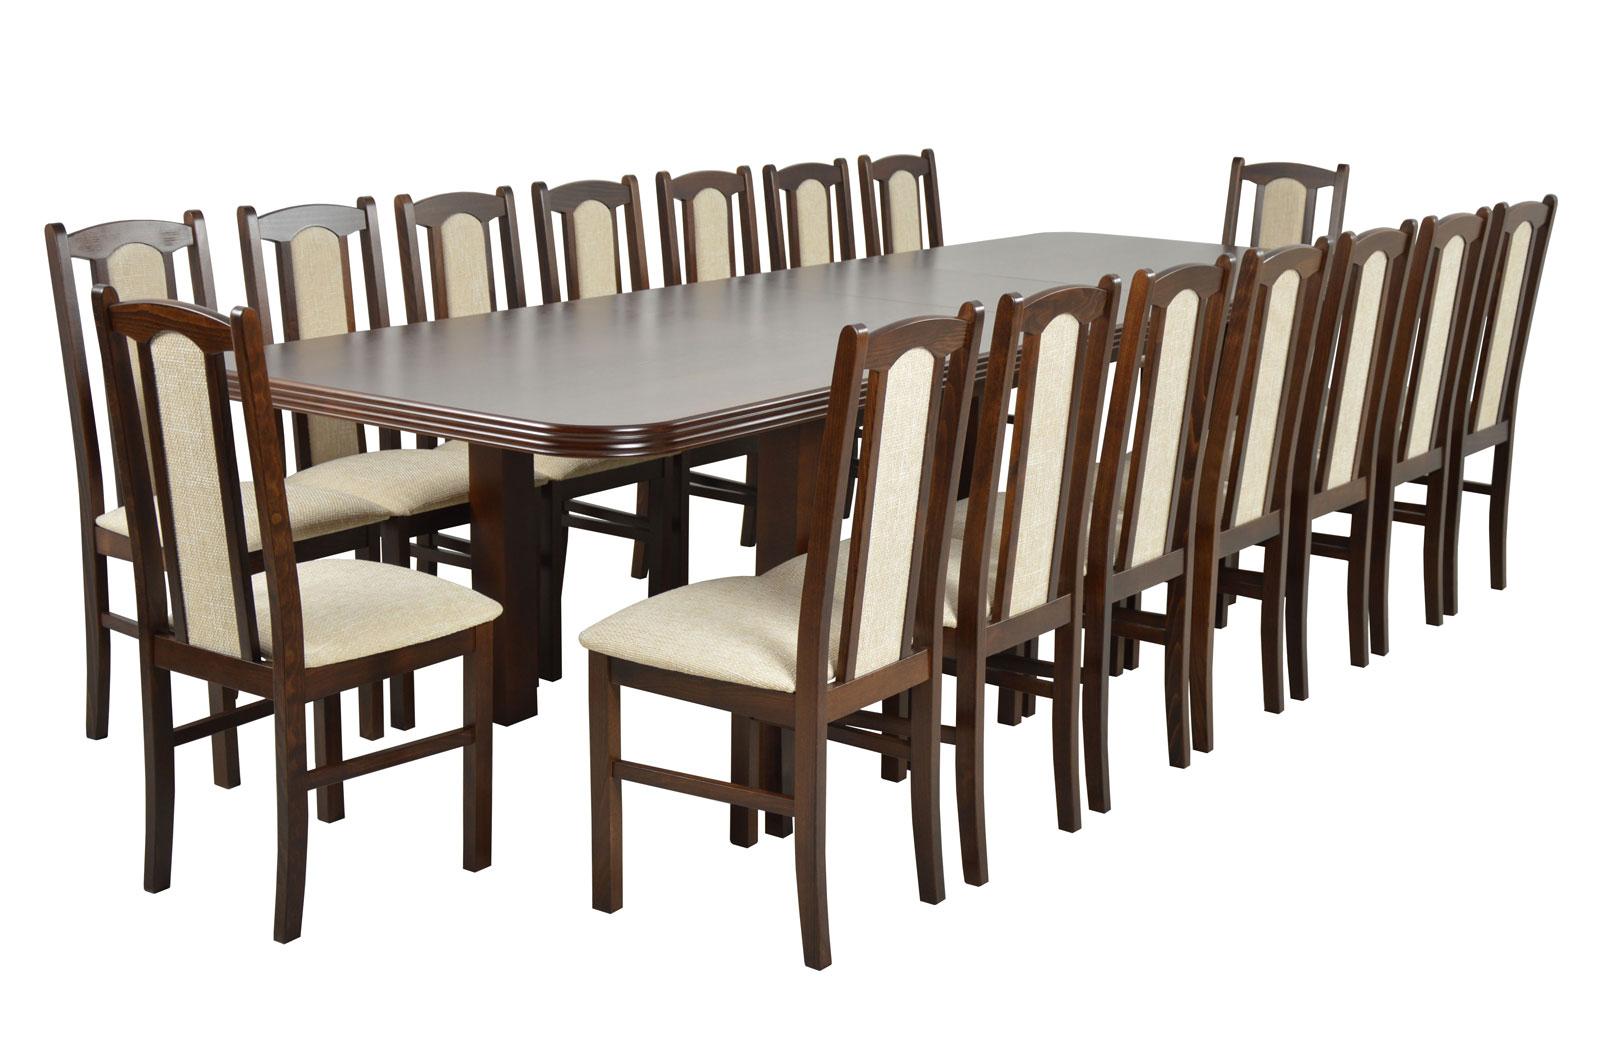 16 Stoličiek + Stôl posuvné 3 m kuchyne